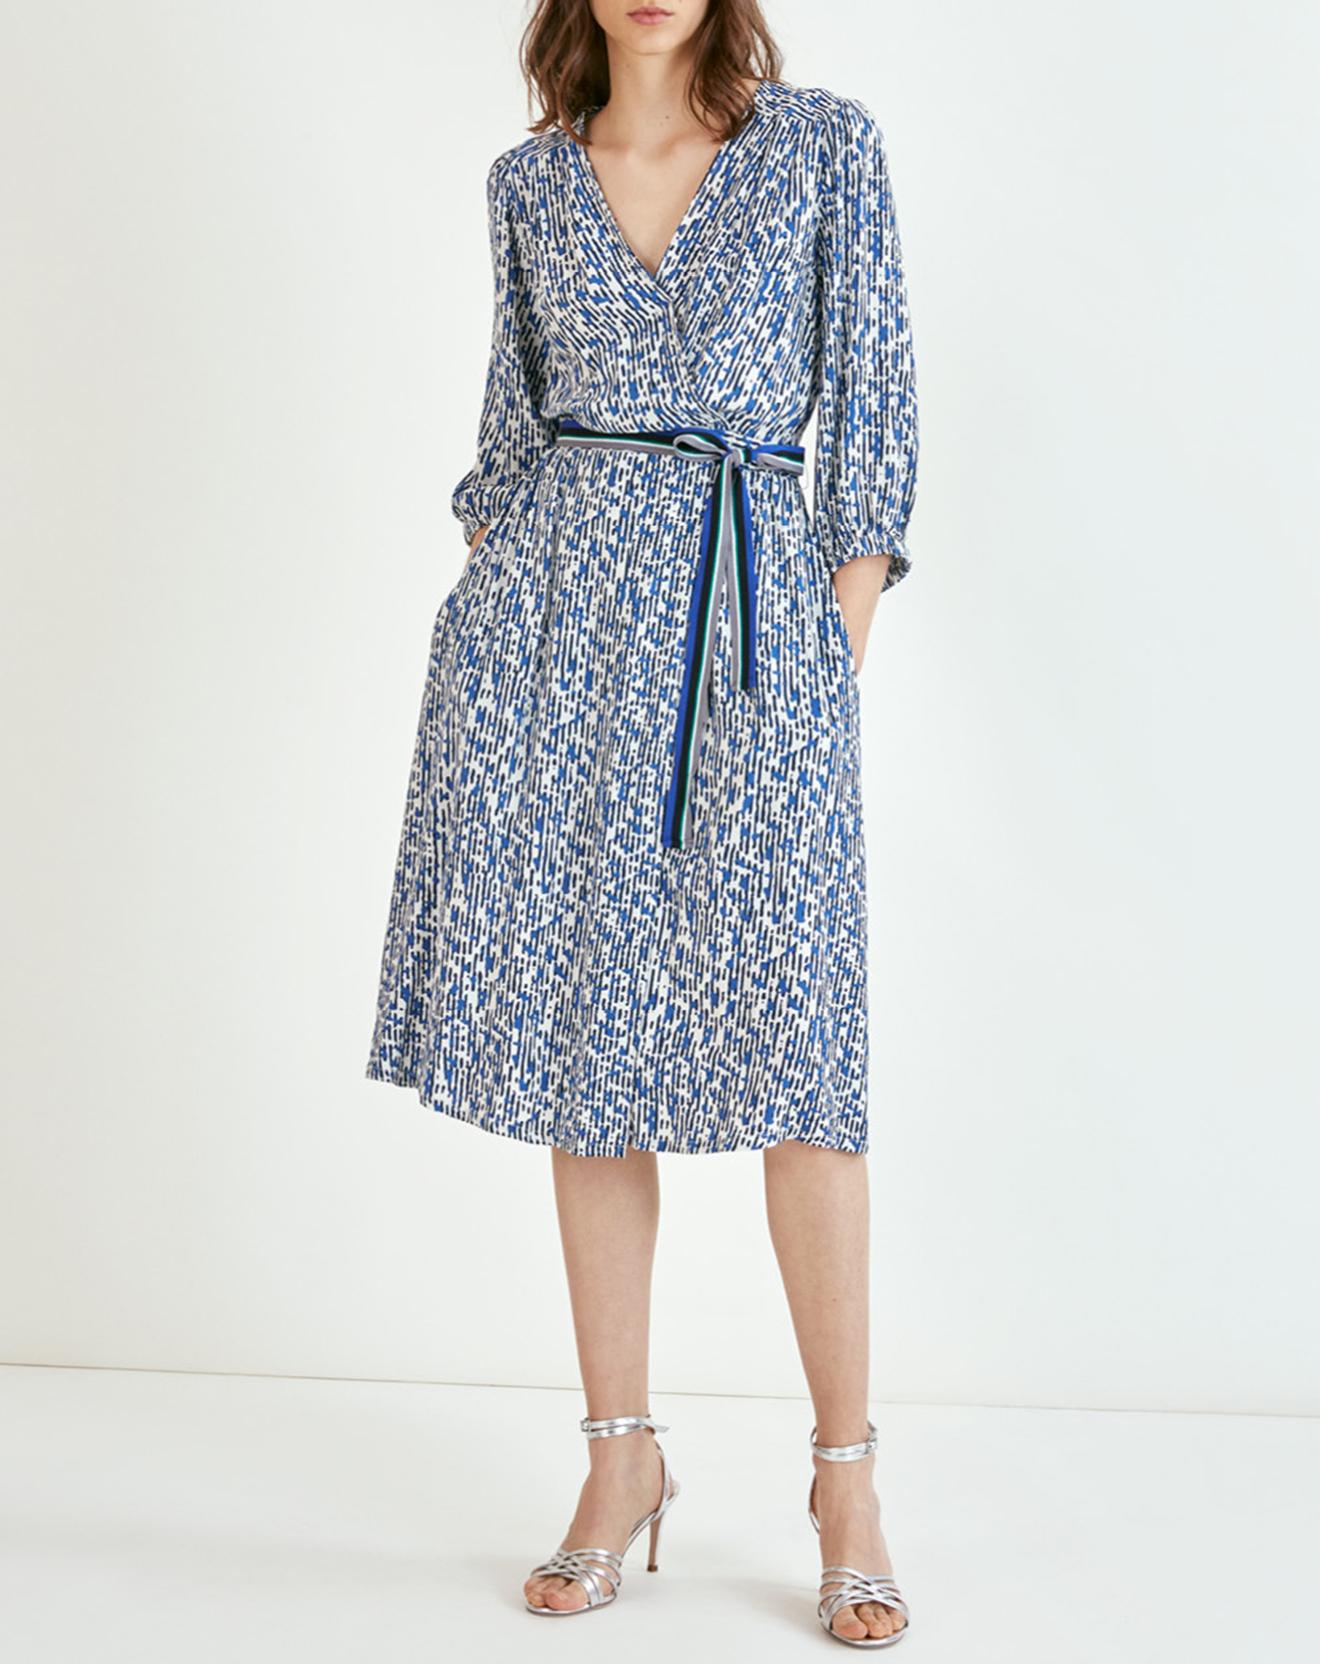 Robe Carmela imprimée bleu roi - Suncoo - Modalova